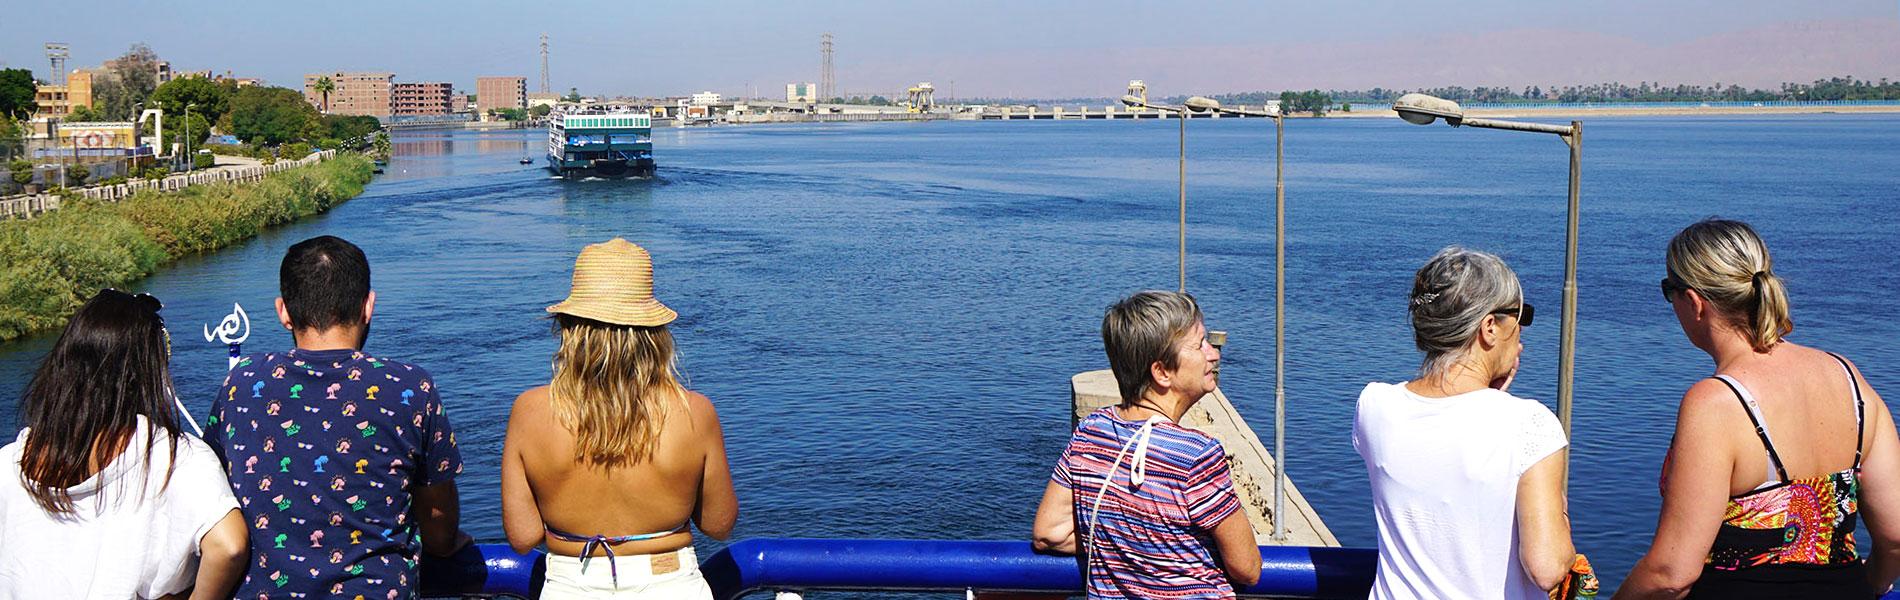 Nile Cruise in Egypt